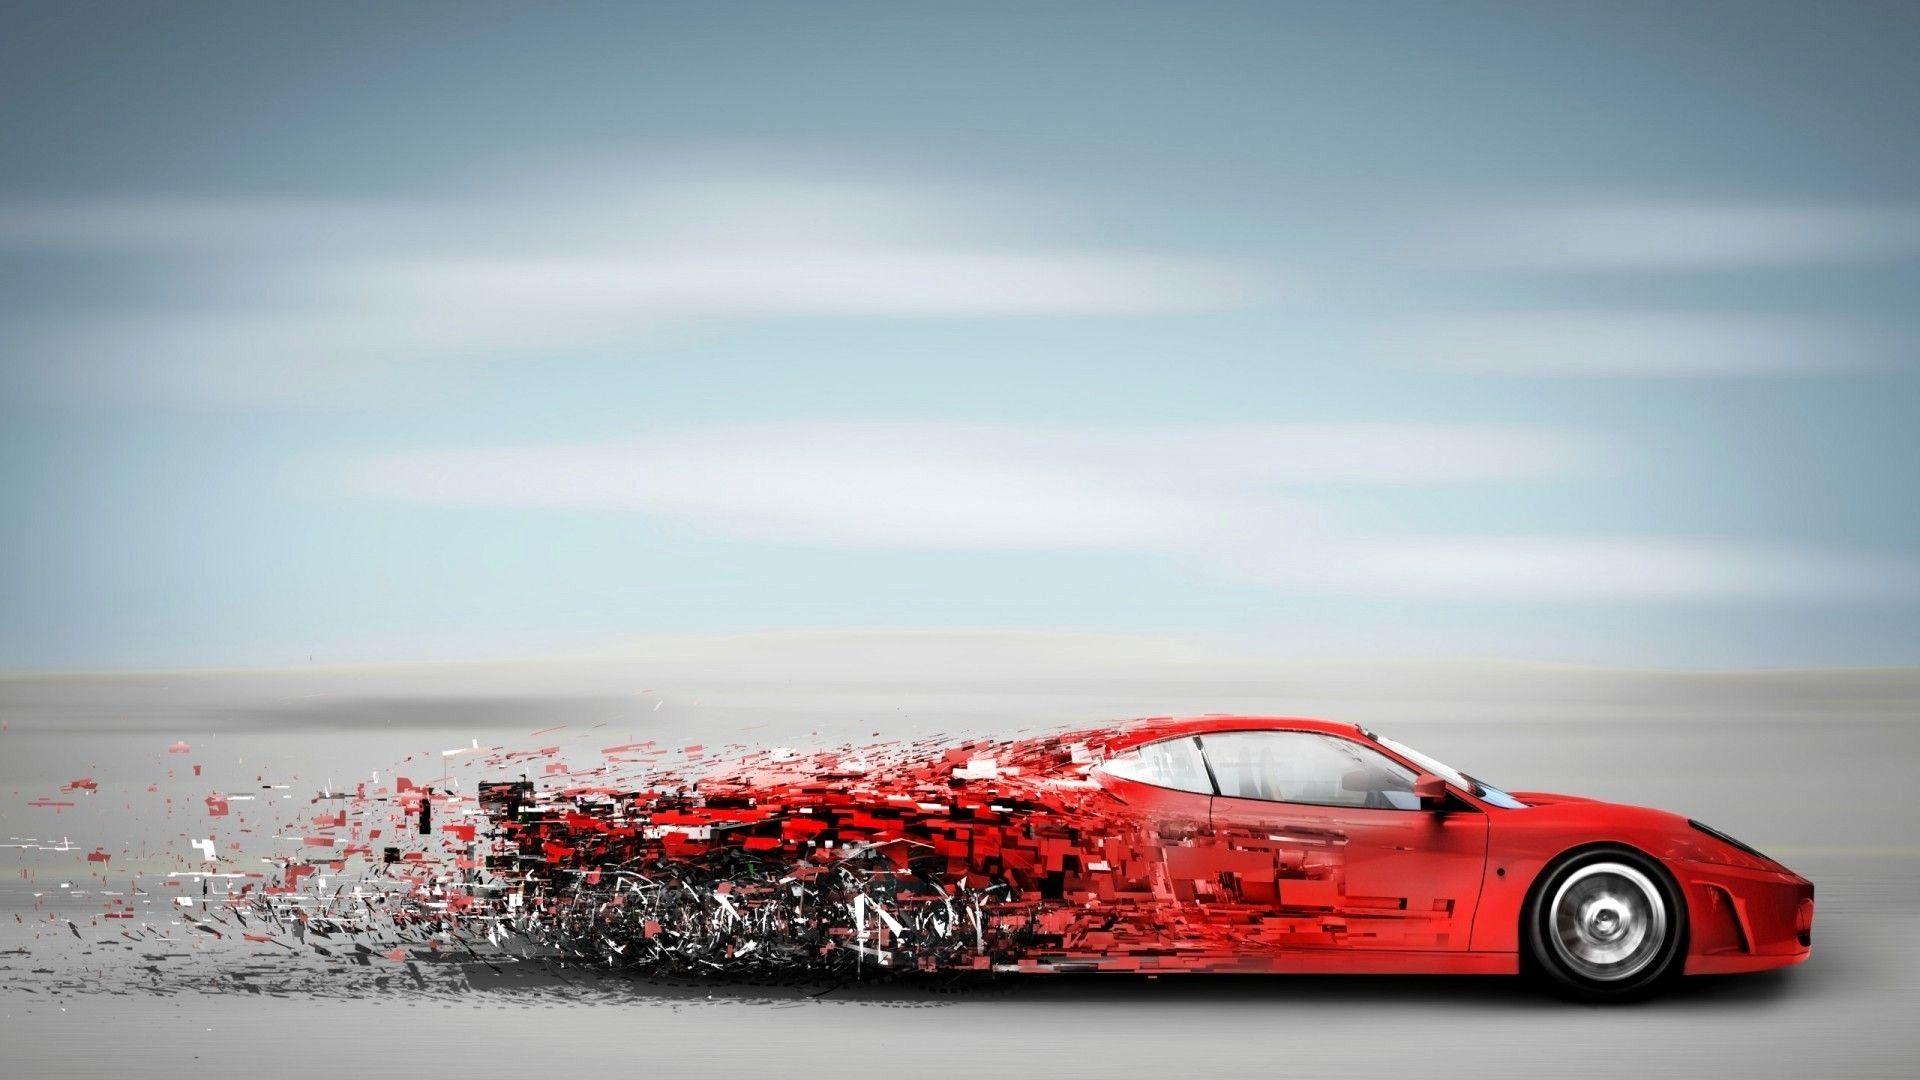 Car Wallpaper Hd 1080p Free Download Car Data On Picture In 2020 Sports Car Wallpaper Car Wallpapers Art Deco Car